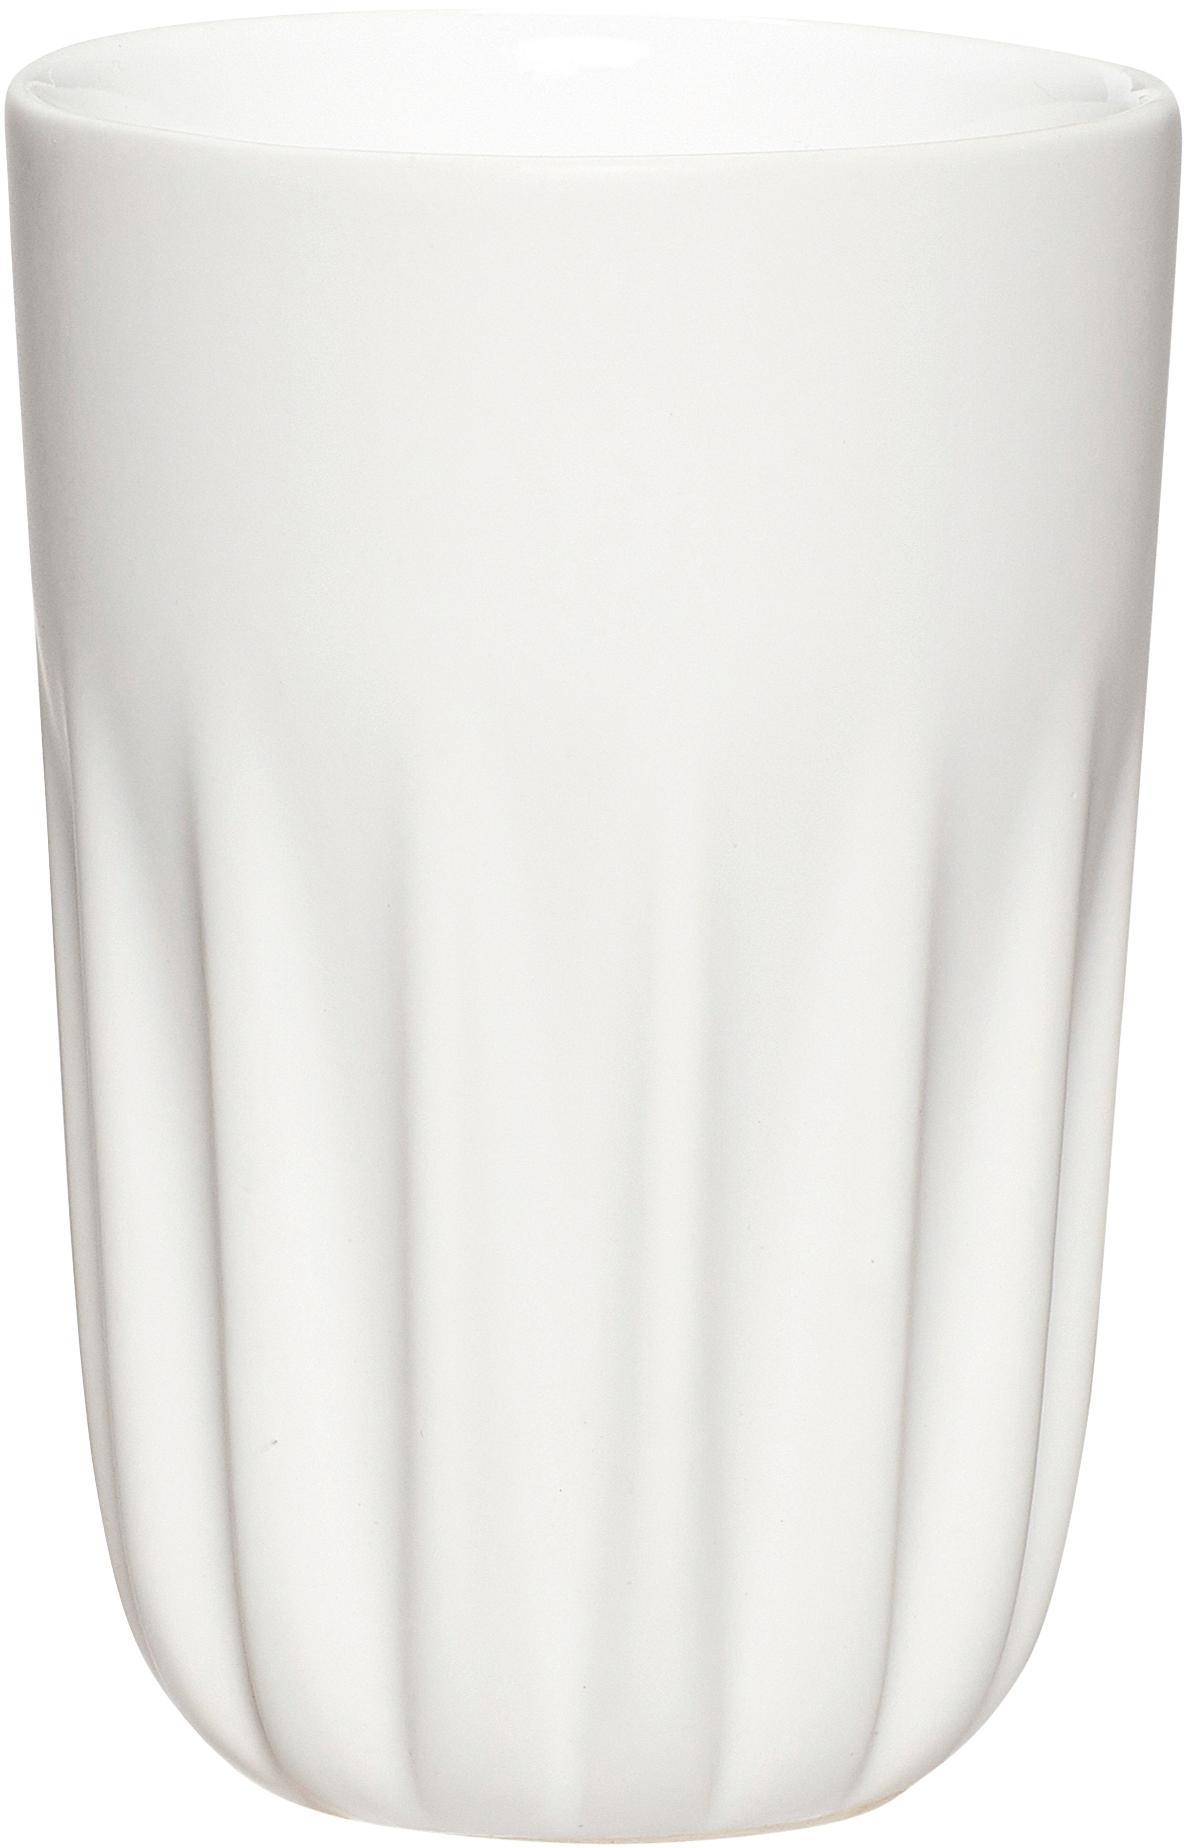 Keramik-Becher Erlang, 3er-Set, Keramik, Weiß, Schwarz, Grau, Ø 8 x H 12 cm